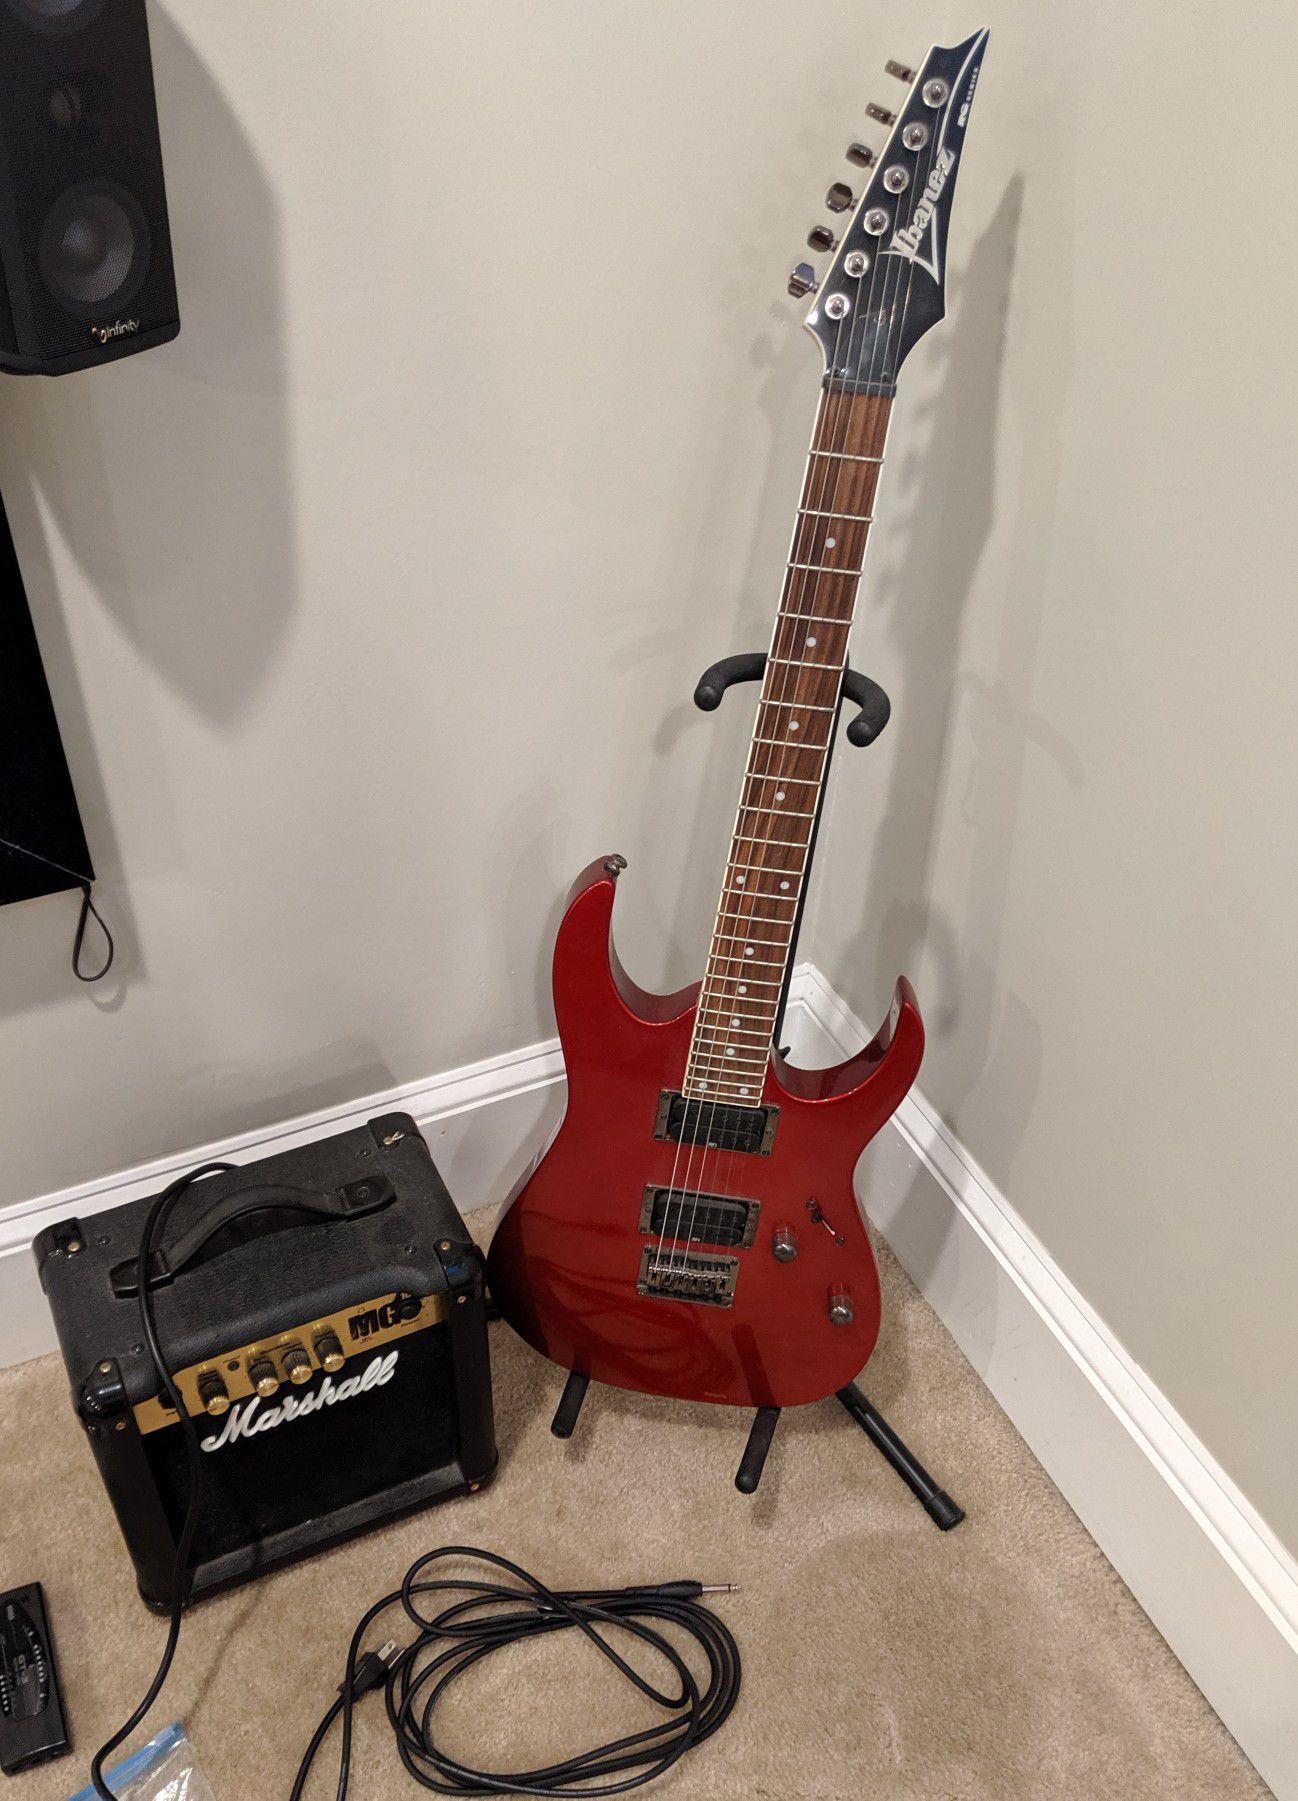 WTS Ibanez guitar, Marshall amp, bag & extras